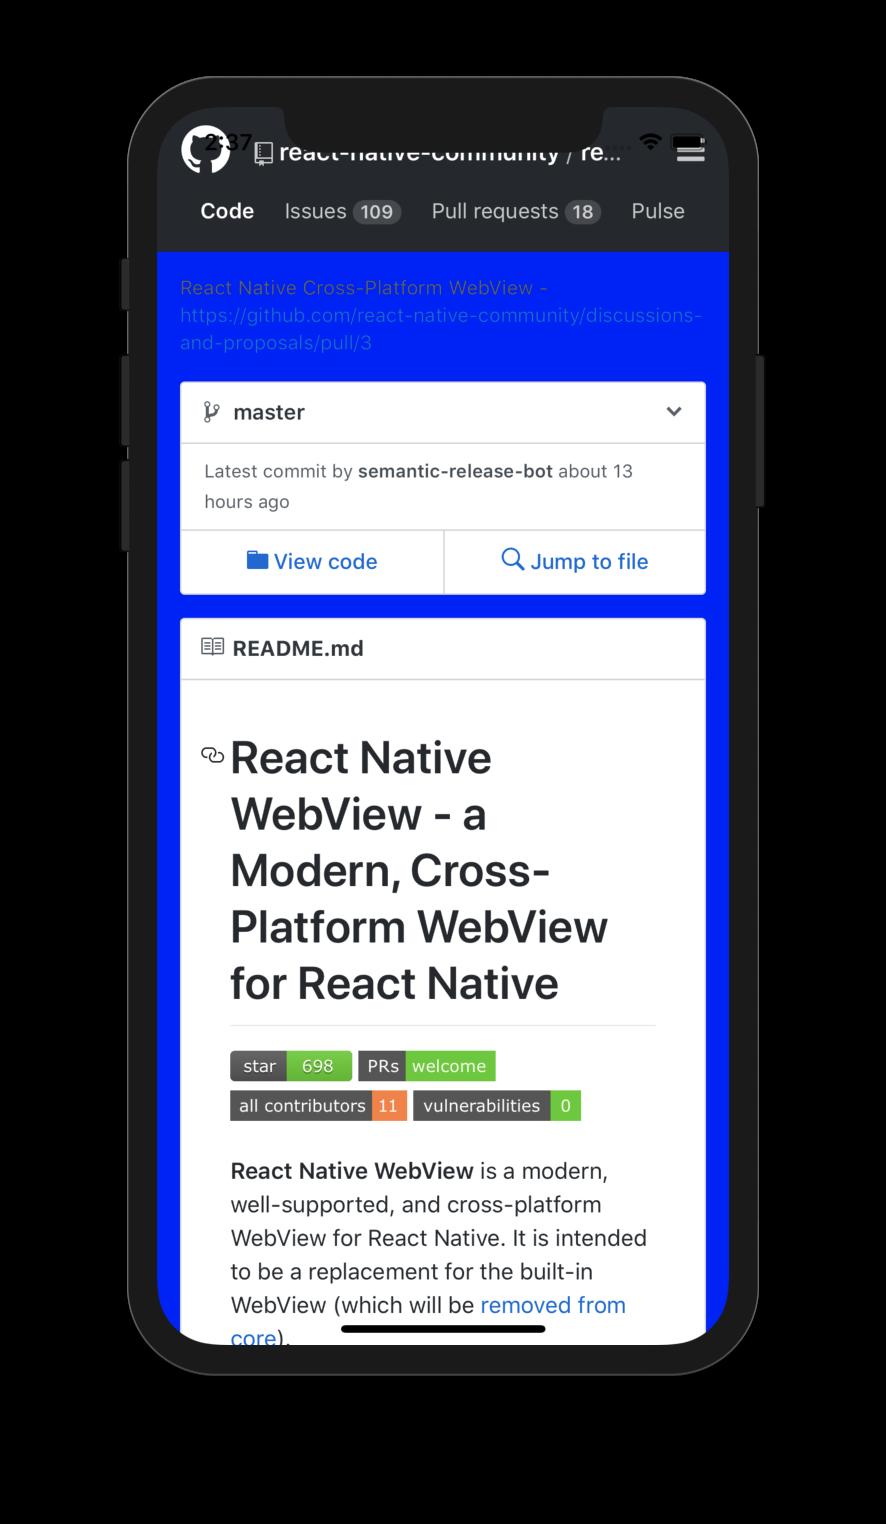 react-native-webview/Guide md at master · react-native